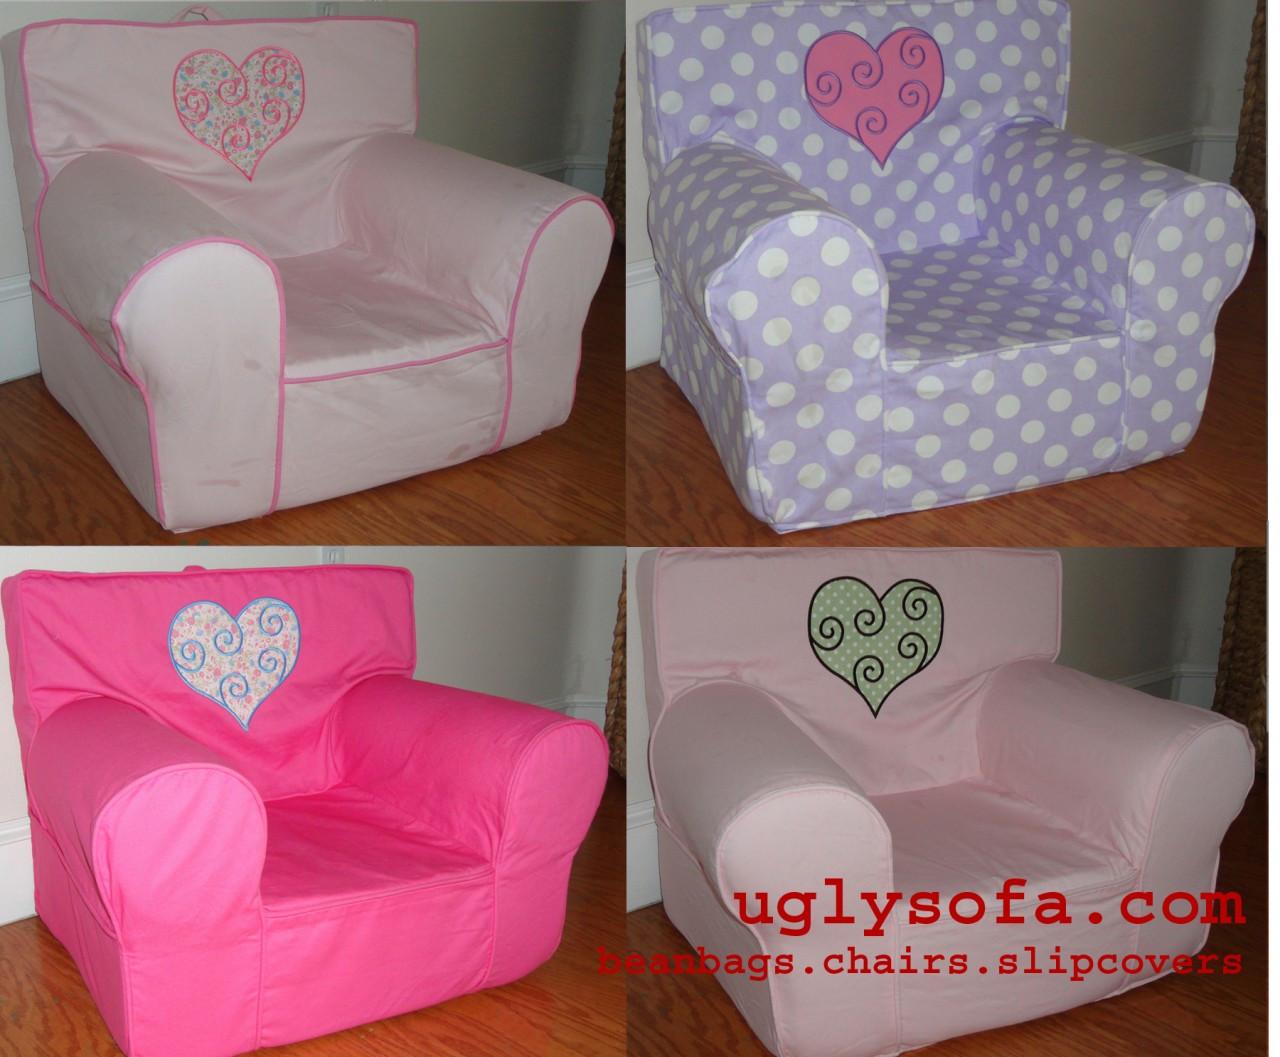 86f33dddf89 uglysofa.com - Ugly-Where appliqe heart anywhere chair - regular size